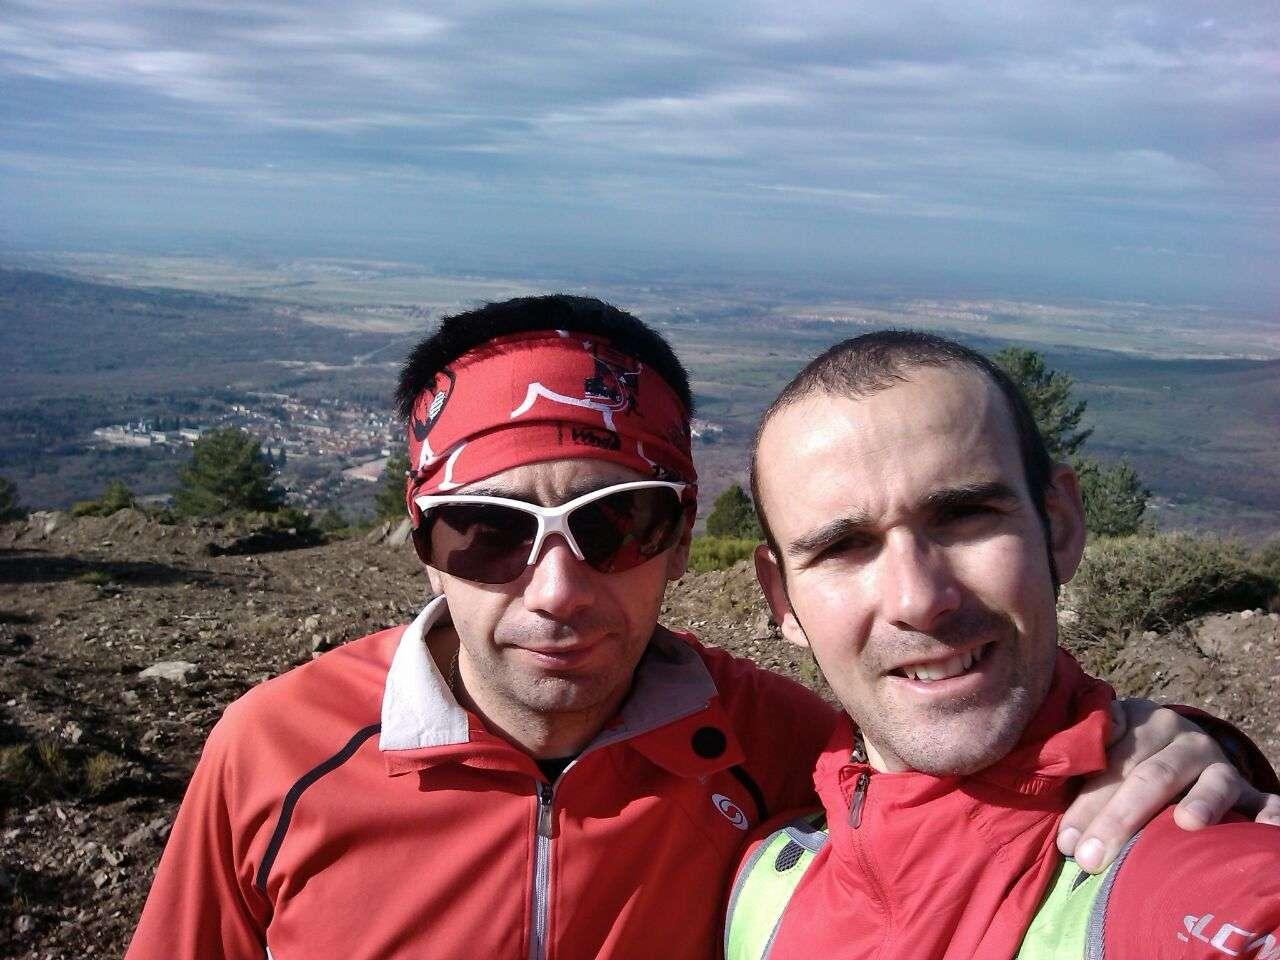 Óscar Baeza y David López Castán. /DAVIDLÓPEZCASTÁN